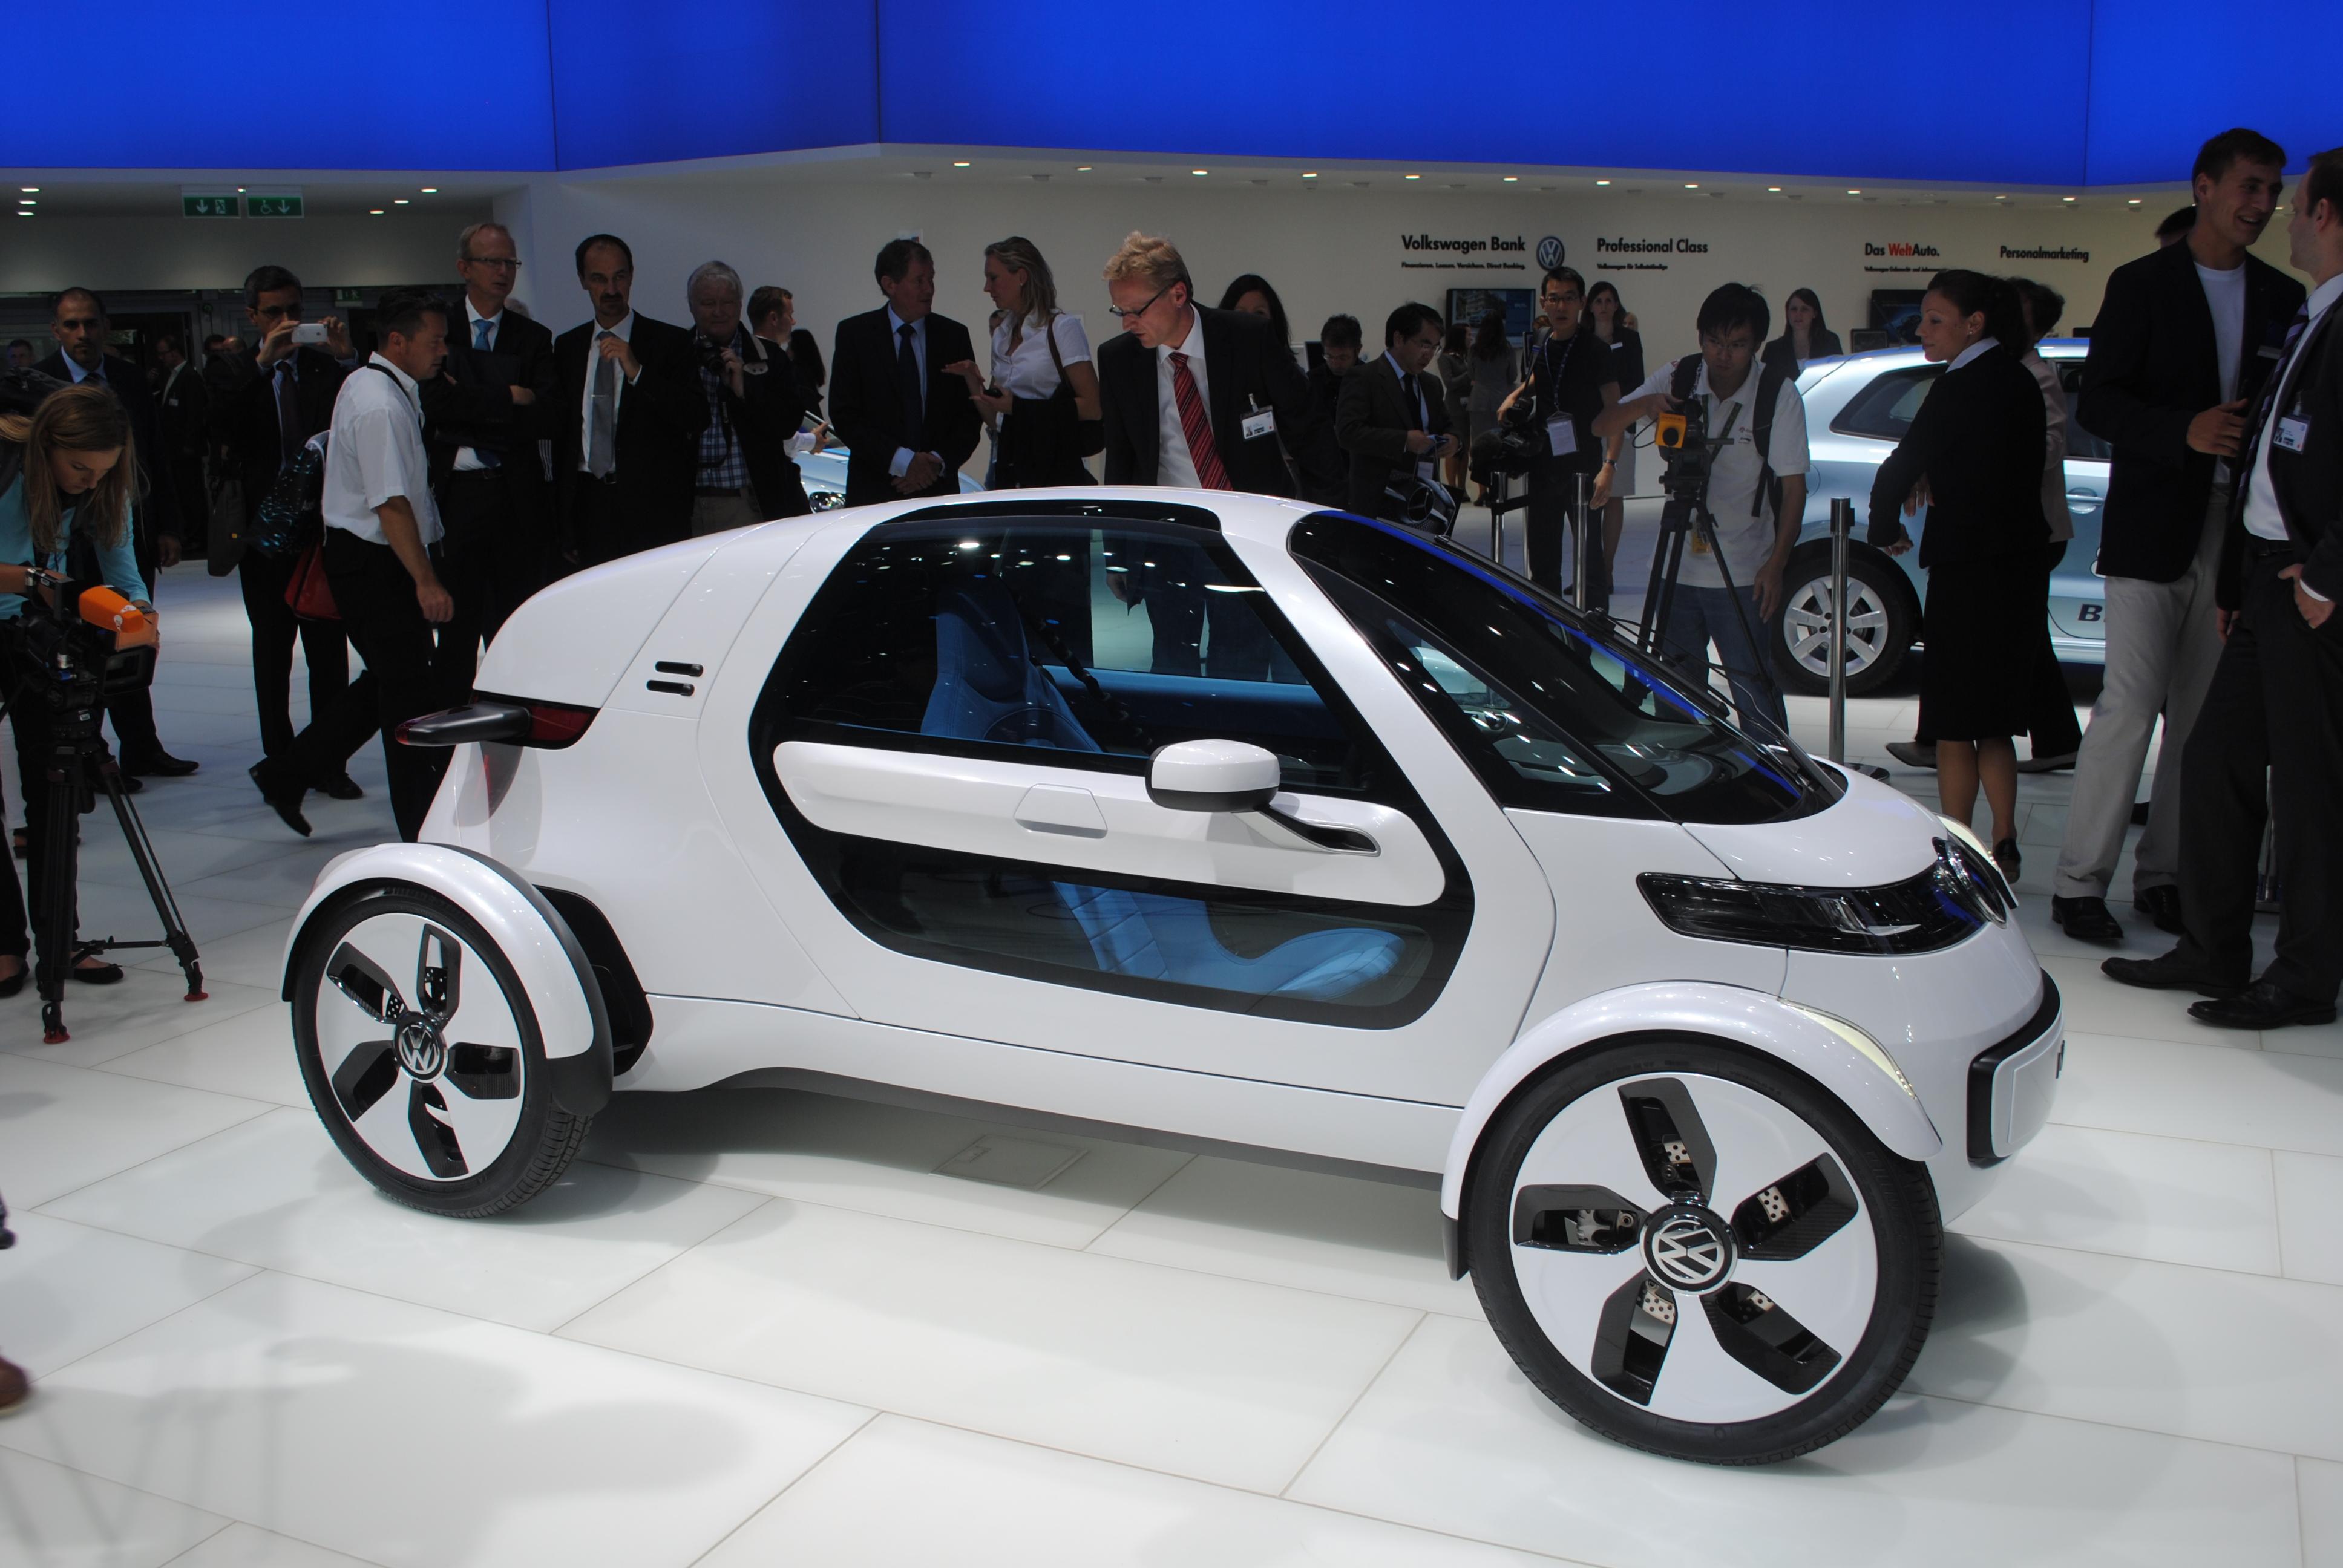 electric car motor horsepower. File:Volkswagen Nils Electric Car Concept At The Frankfurt Motor Show IAA 2011 (6143741096 Horsepower